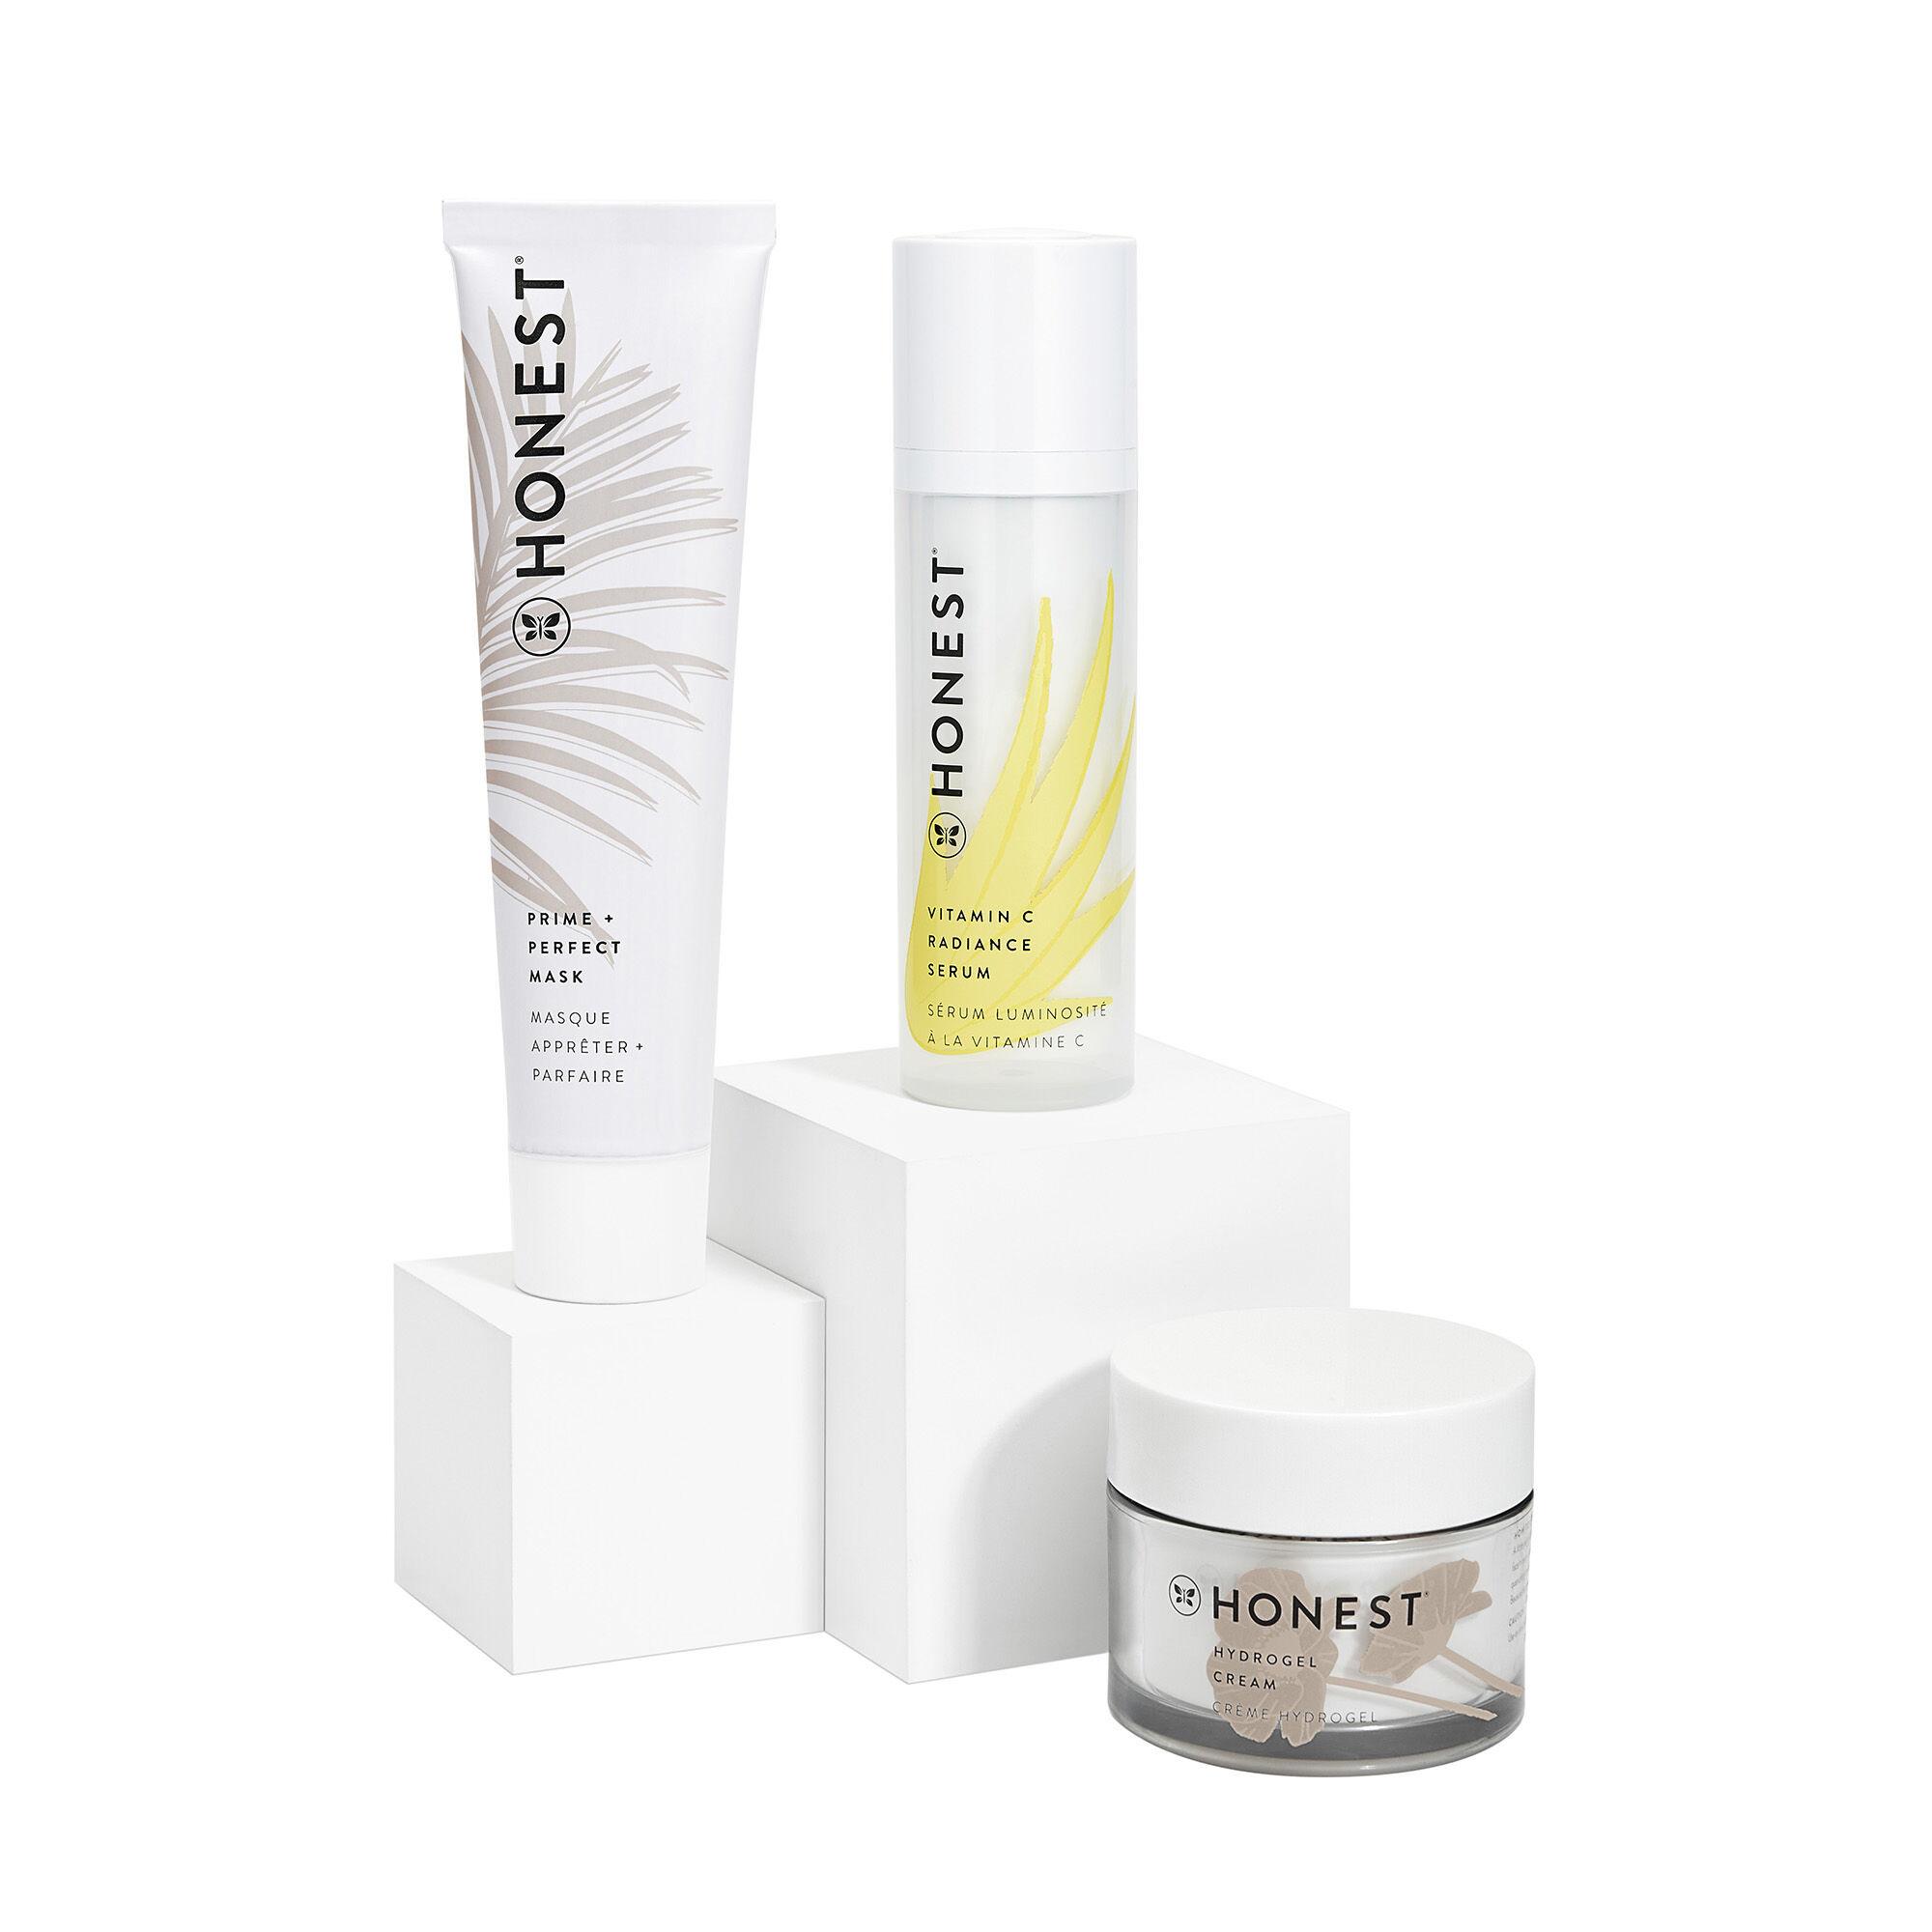 3 Steps to Flawless Skin Kit